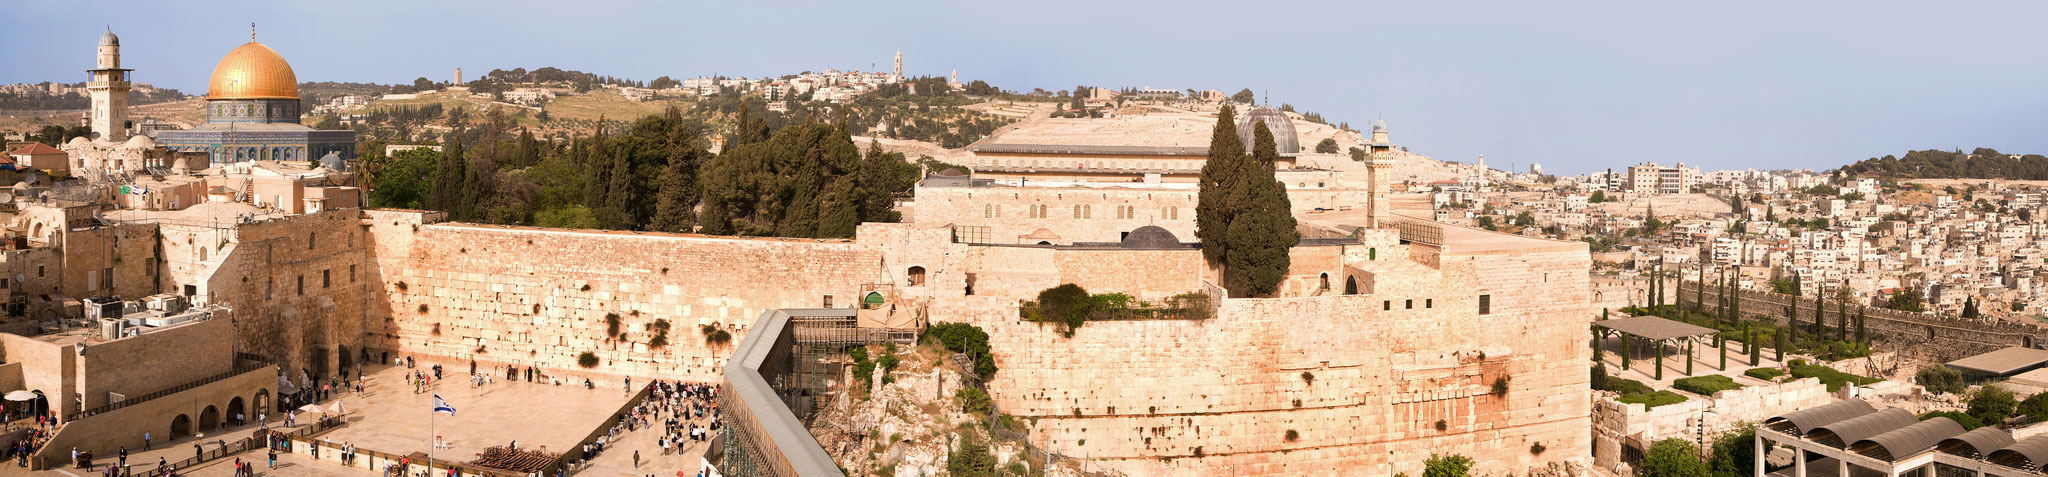 Israel: Land Of The Crusades – Part 2 8